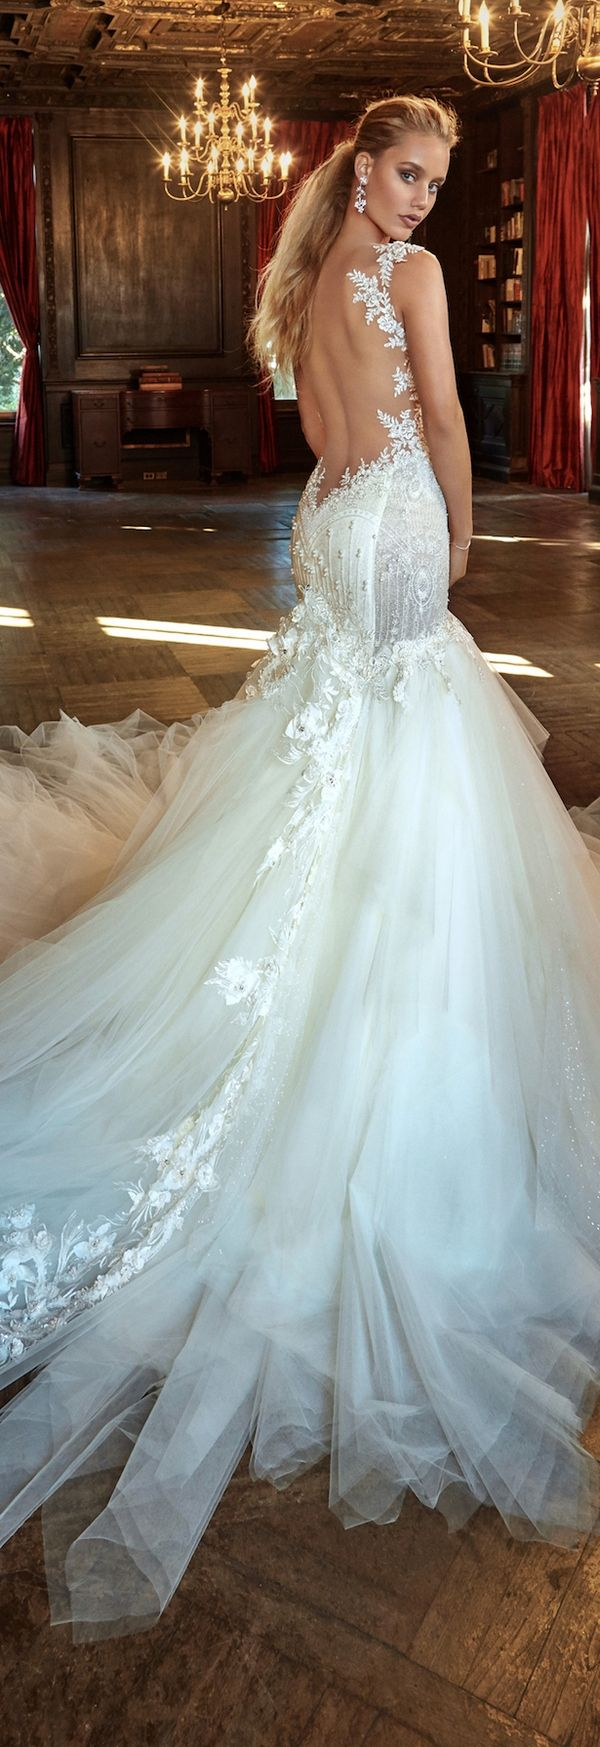 best wedding images on pinterest wedding dressses bridal